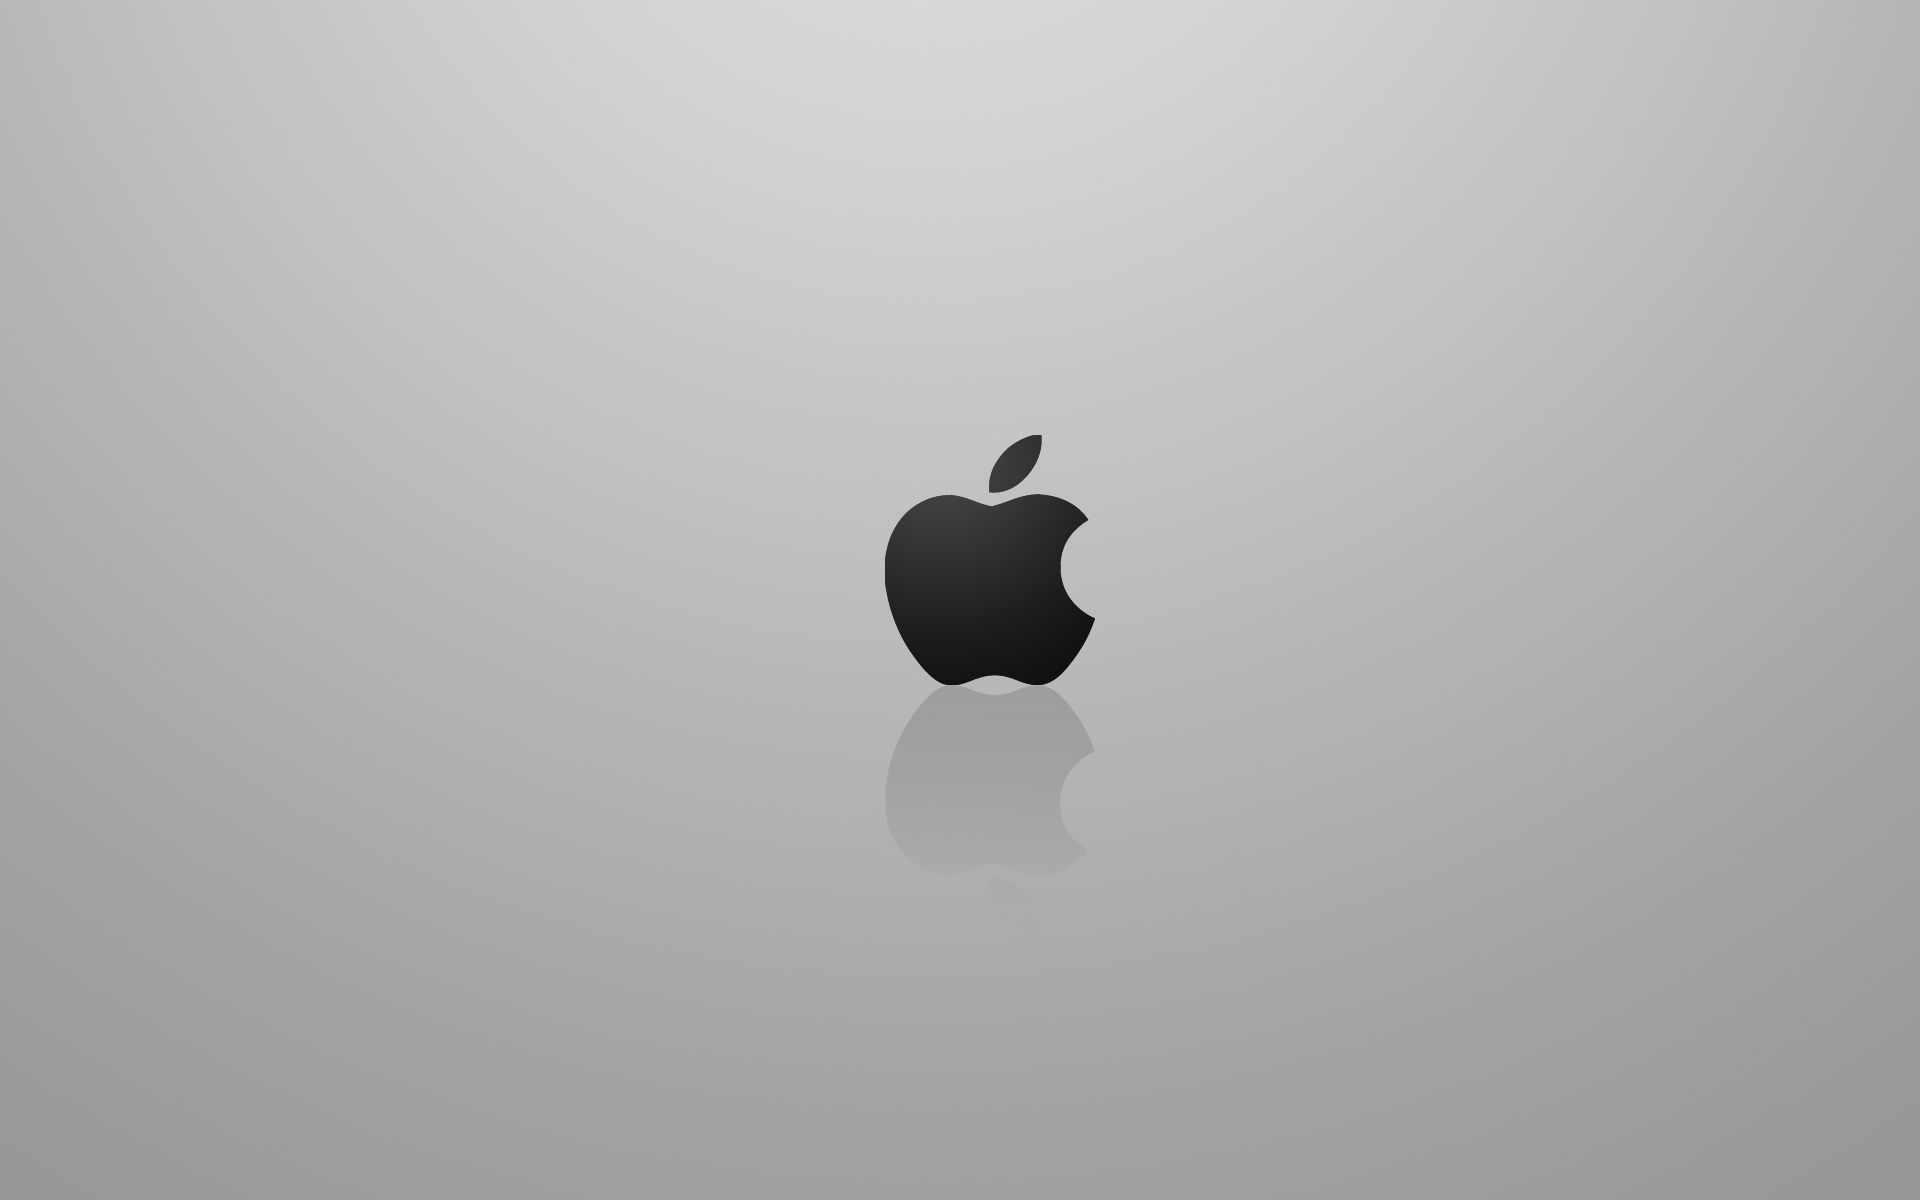 wallpaper android vs apple vs windows 8